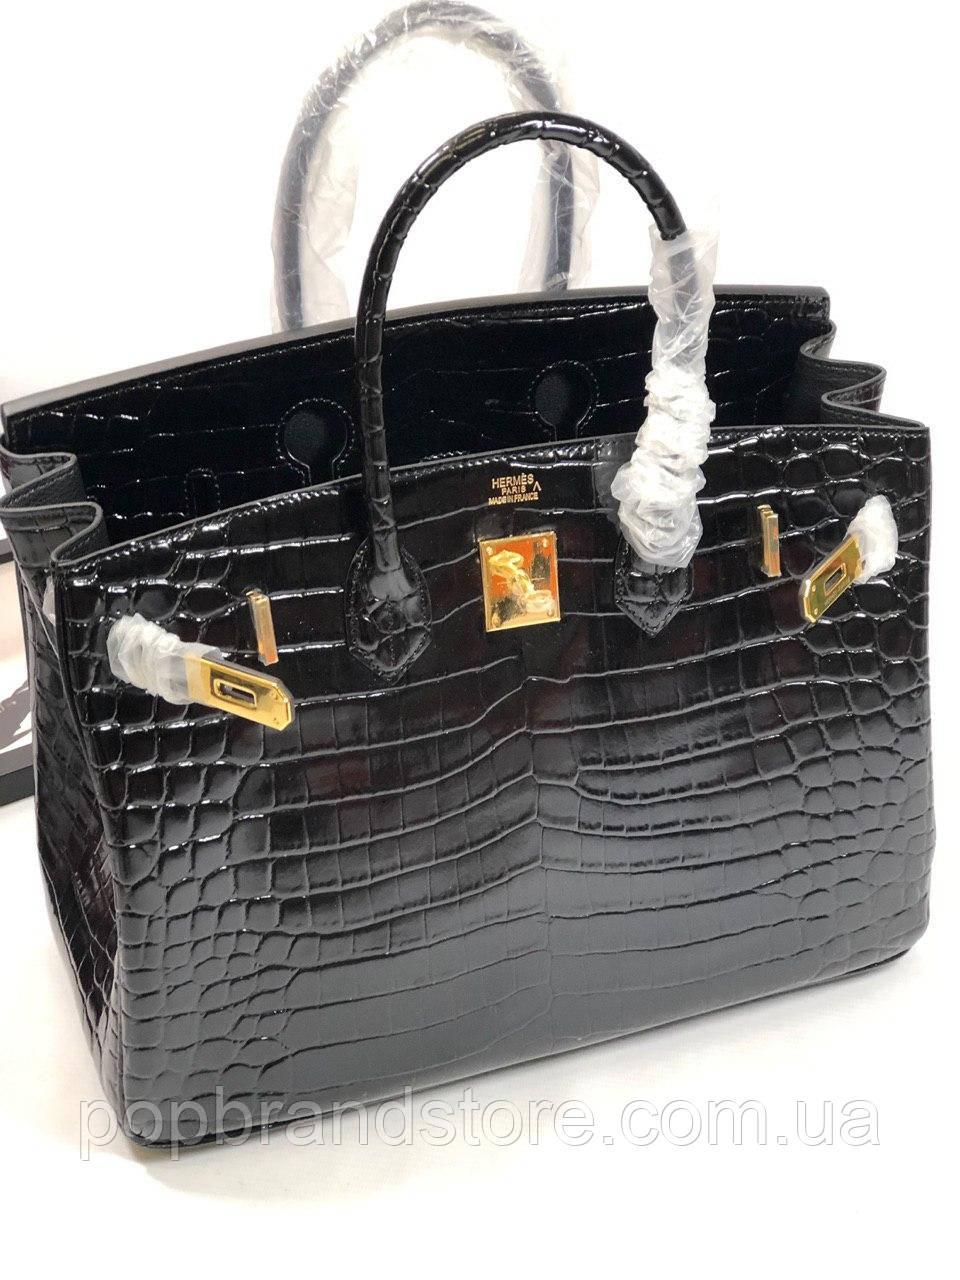 76907ed60e7e Женская сумка Гермес Биркин 35 см натуральная кожа под кроко (реплика) -  Pop Brand